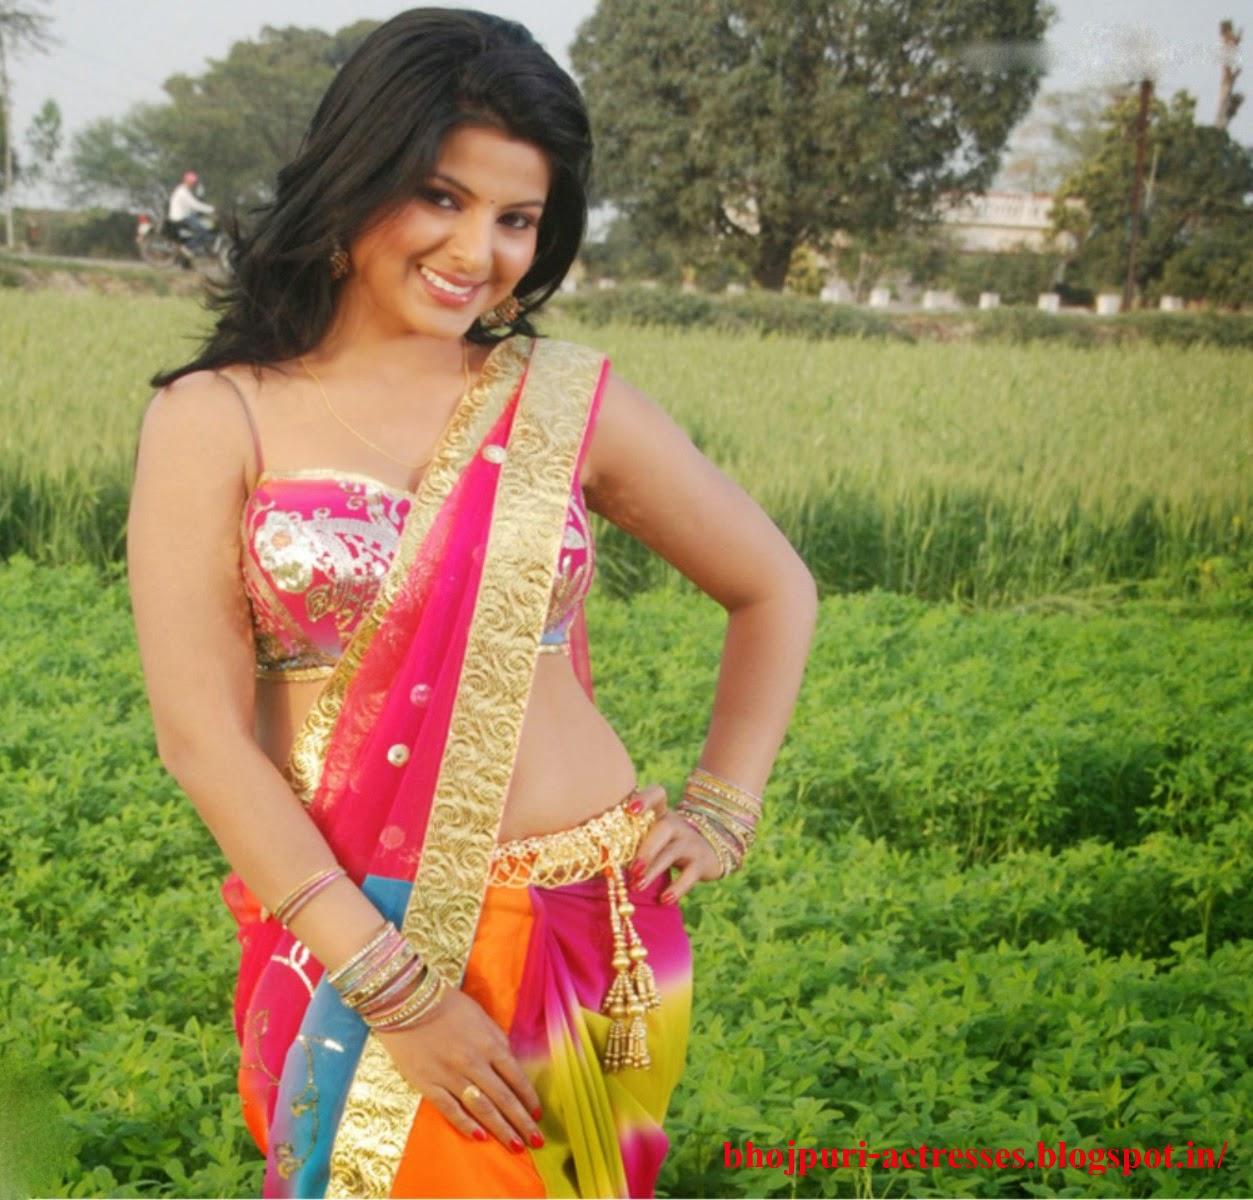 Bhojpuri World  Bhojpuri Film Actress Wallpaper Hot Bhojpuri Film Actress Smriti Sinha Image -8475